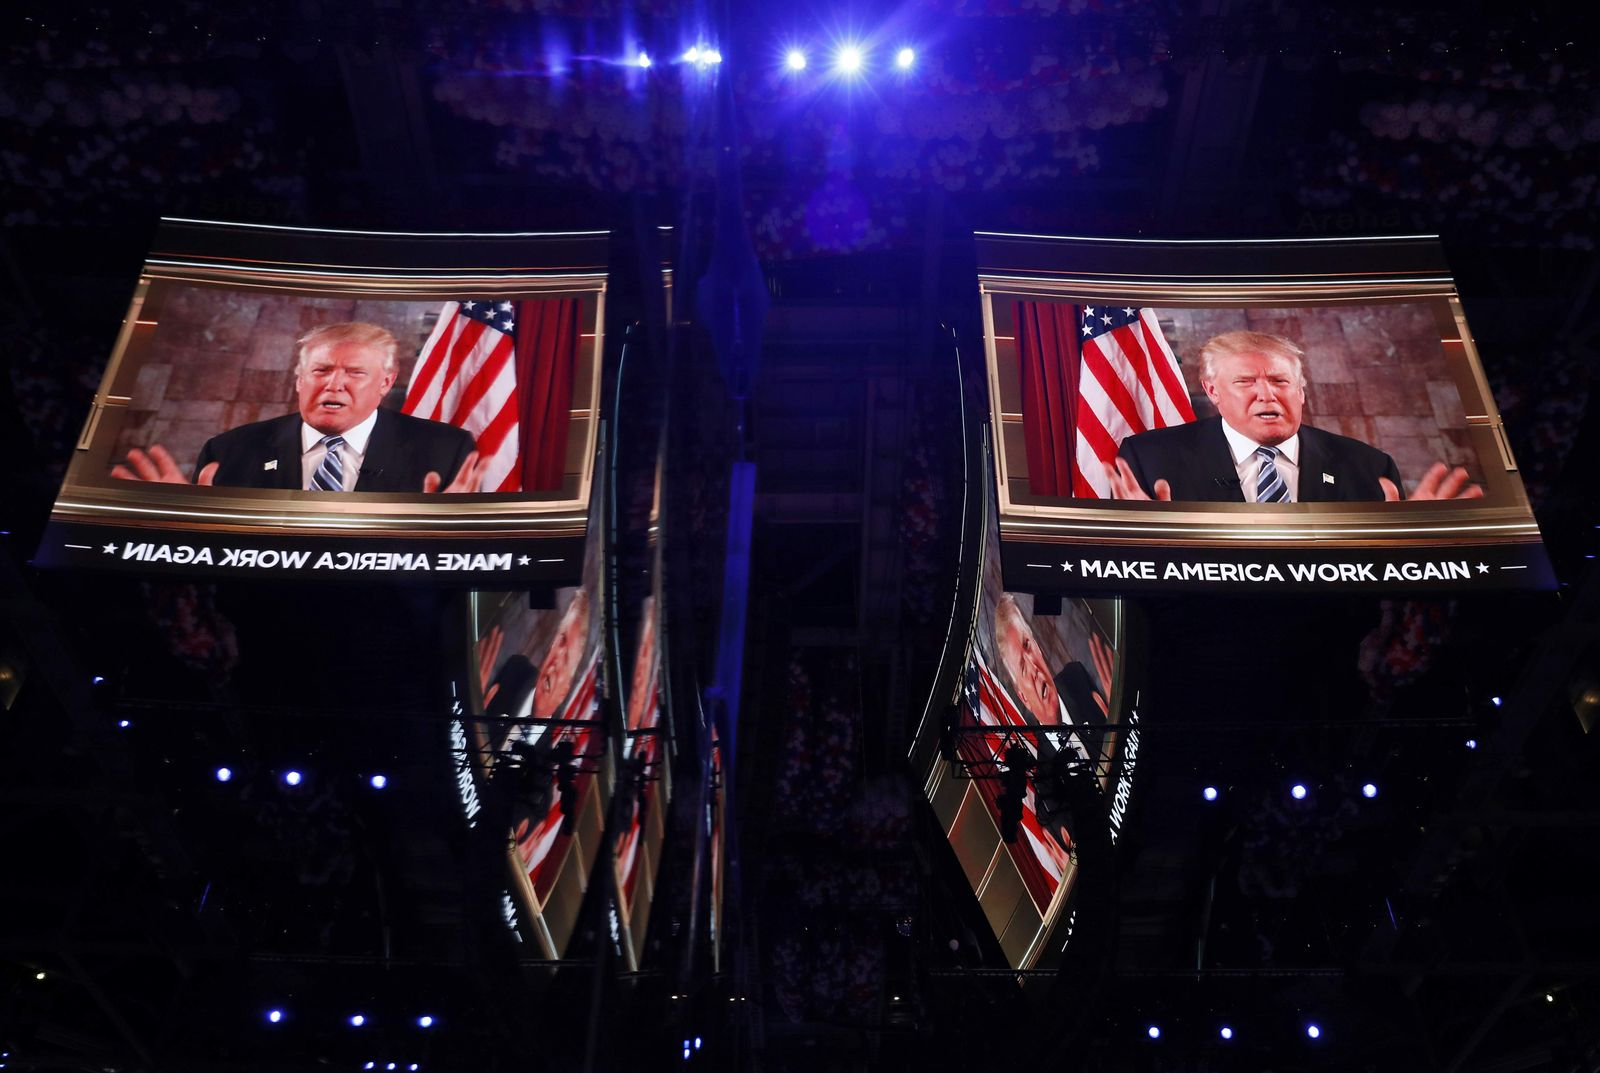 Donald Trump / GOP